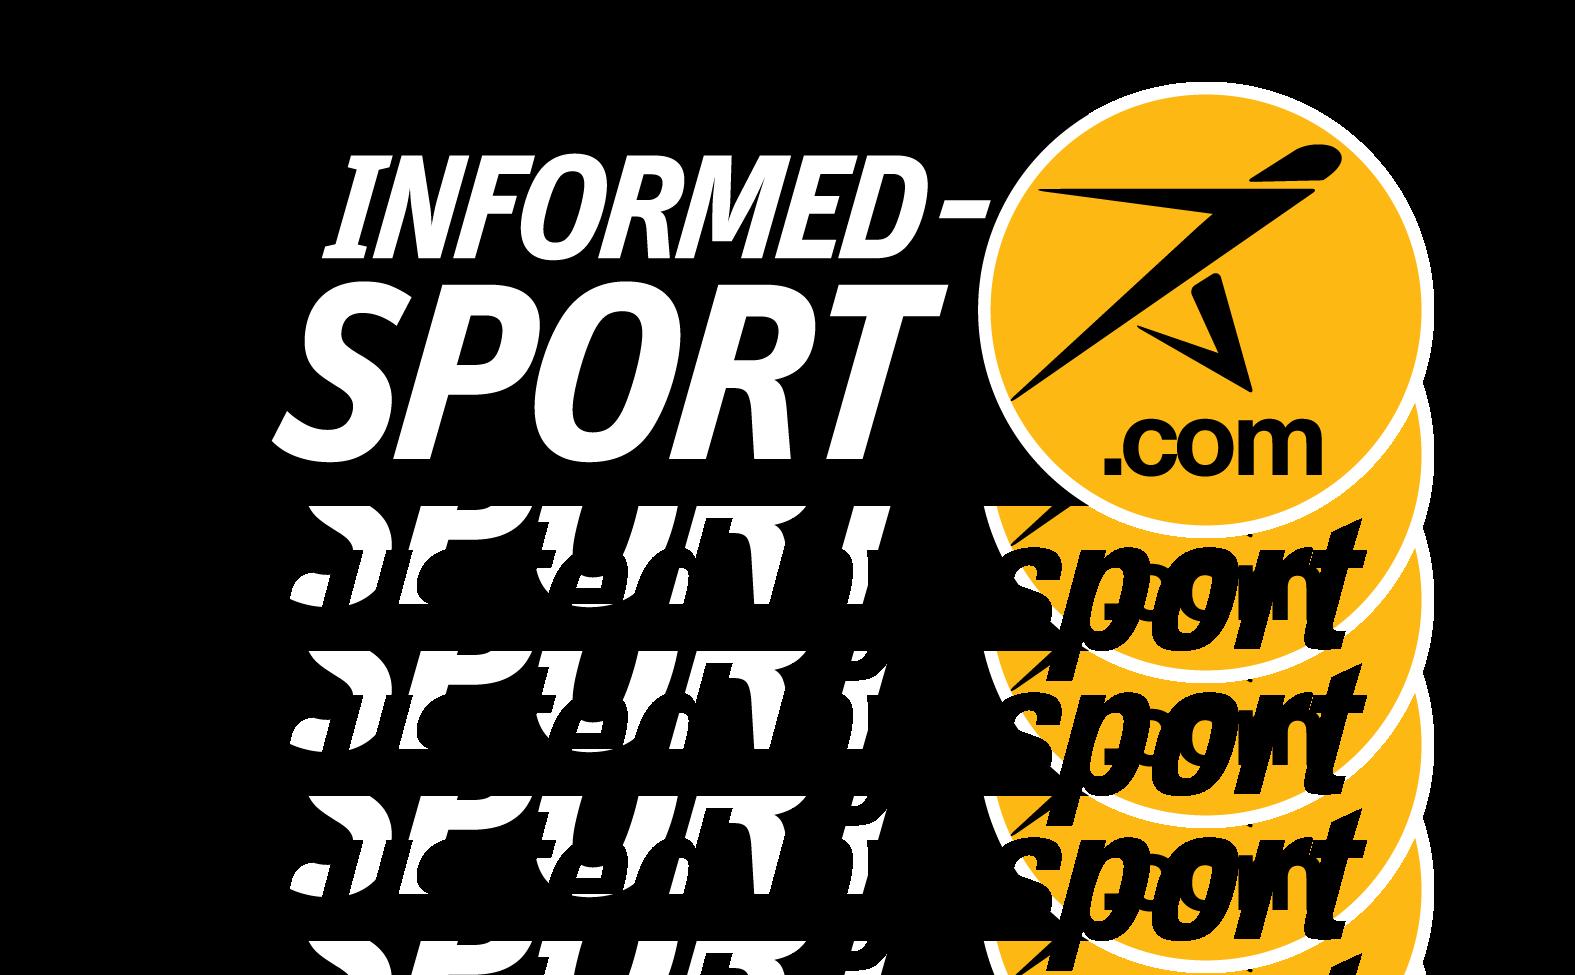 logo_informed_sport_herbalife.png